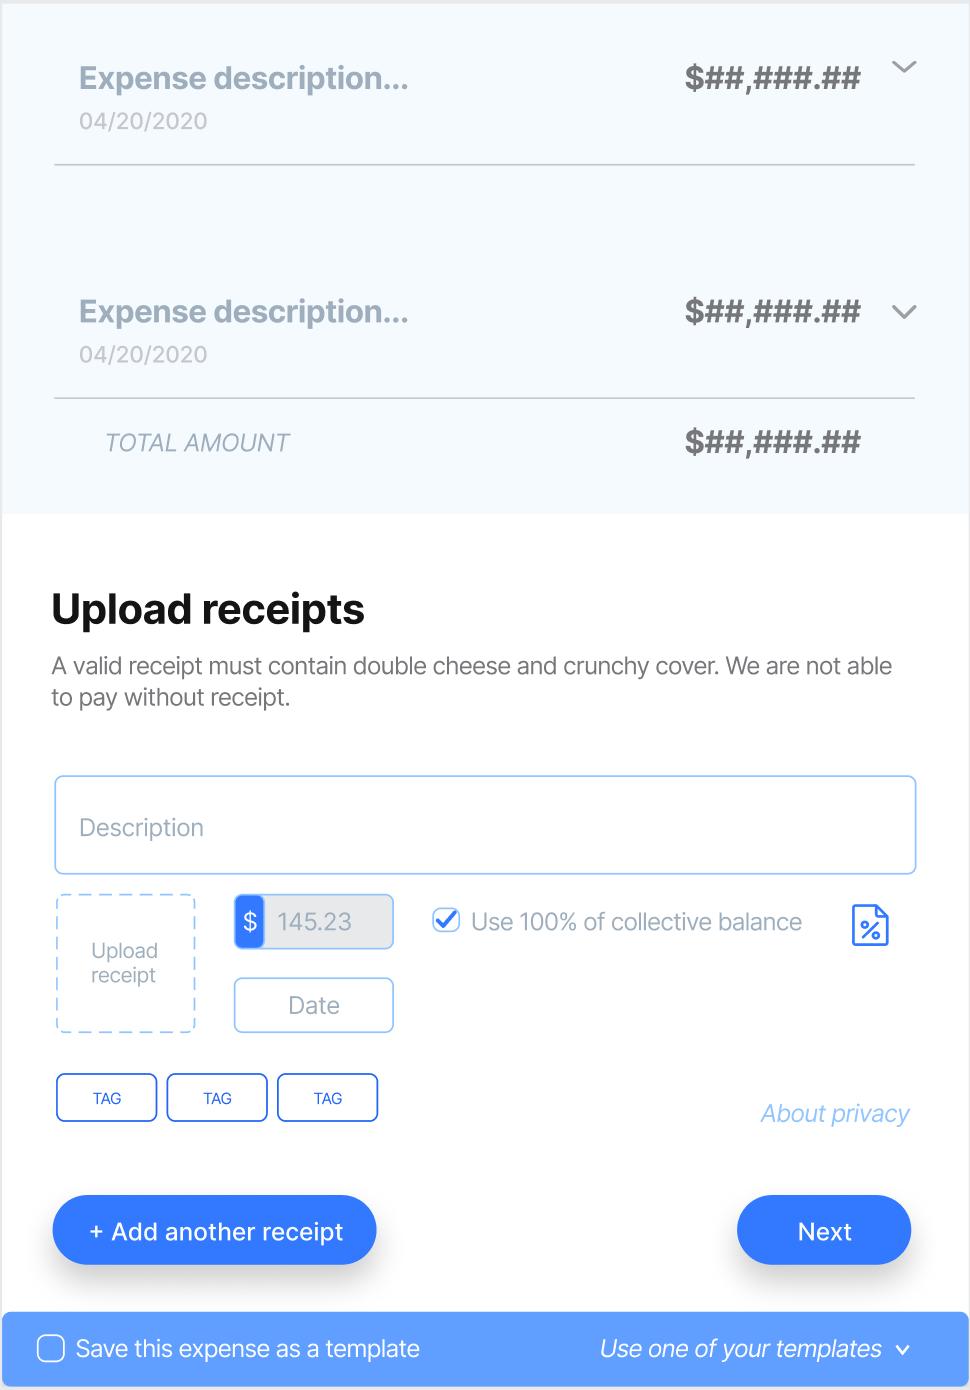 Batch expense